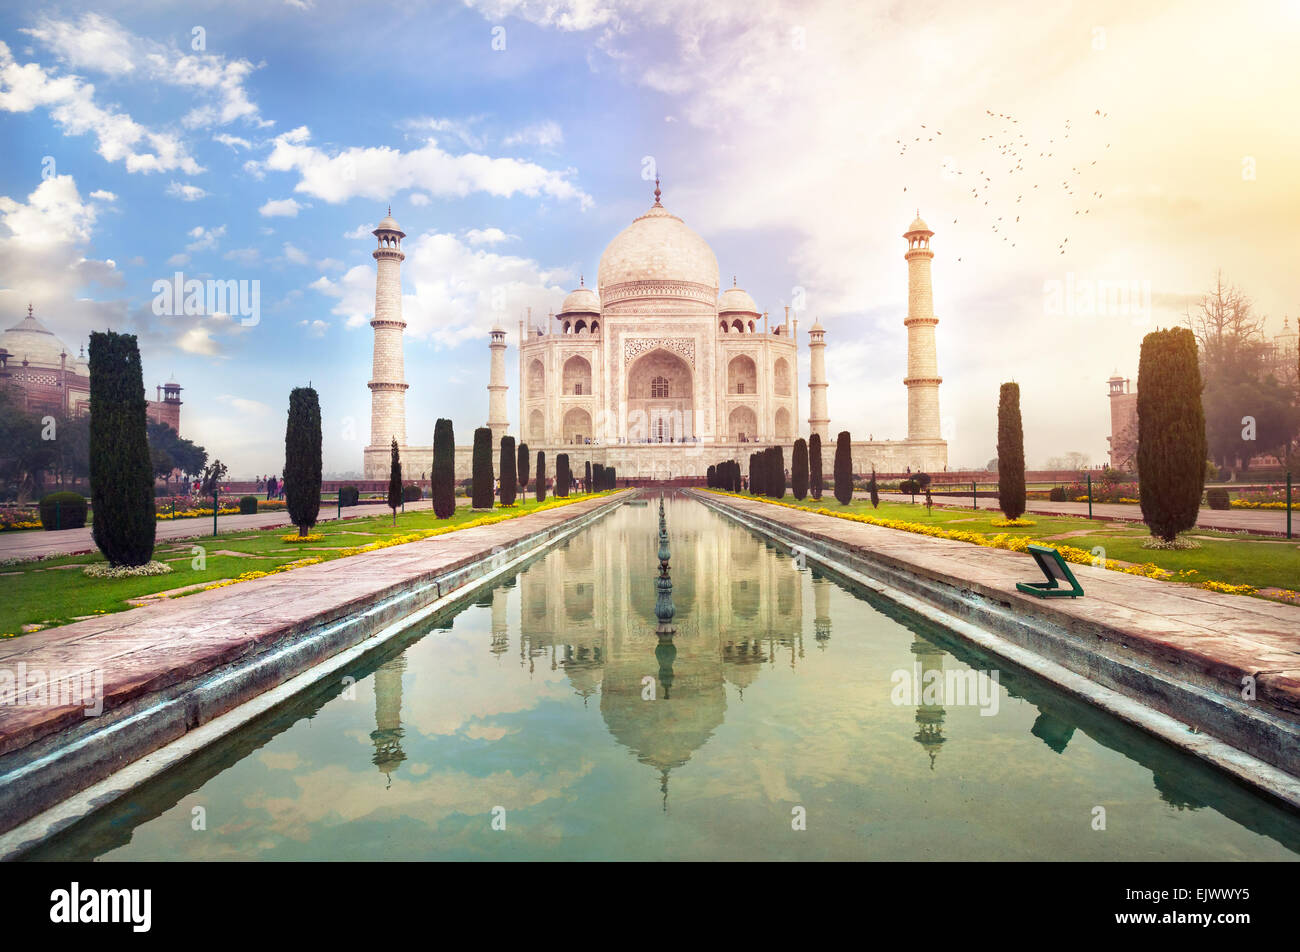 Taj Mahal tumba con reflejo en el agua en azul cielo dramático en Agra, Uttar Pradesh, India Imagen De Stock